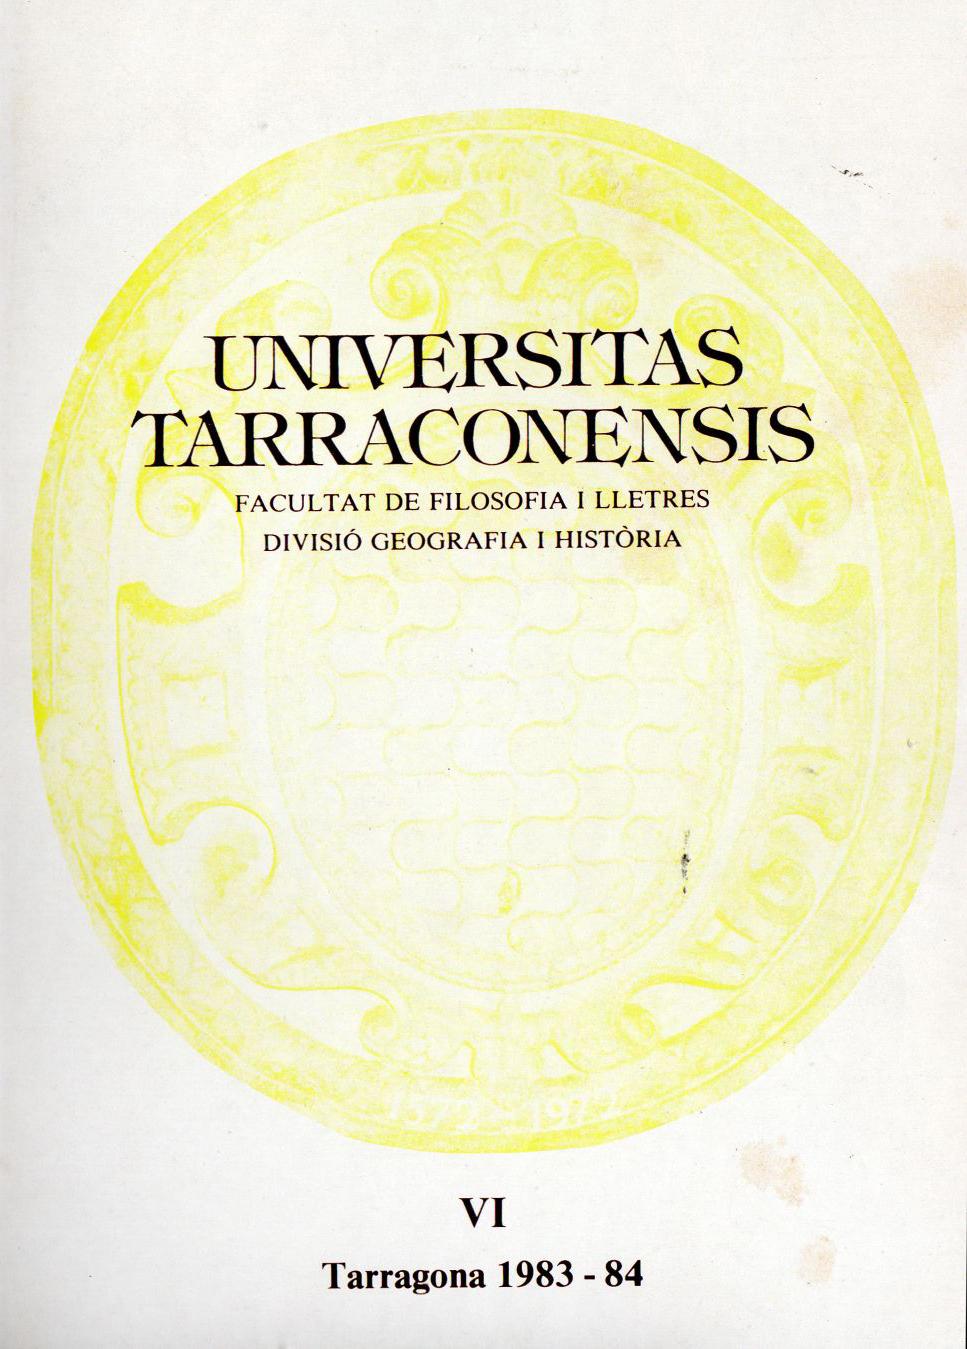 Universitas Tarraconensis. Revista de Geografia, Història i Filosofia. 1983-1984